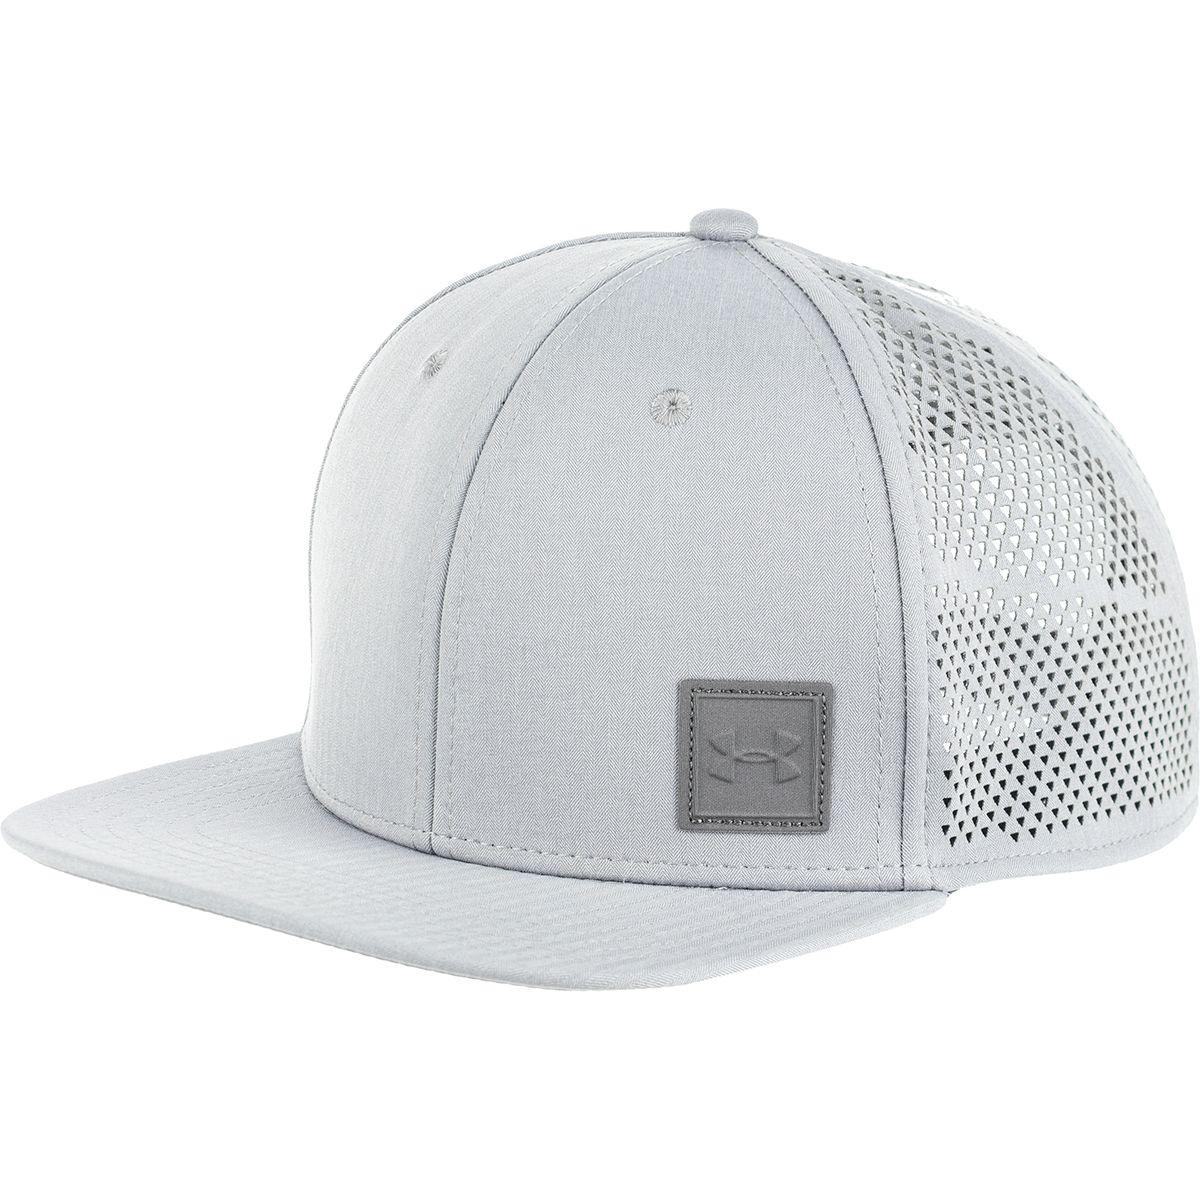 0c90a7928b3 Under Armour Supervent Flat Brim 2.0 Snapback Hat for Men - Lyst